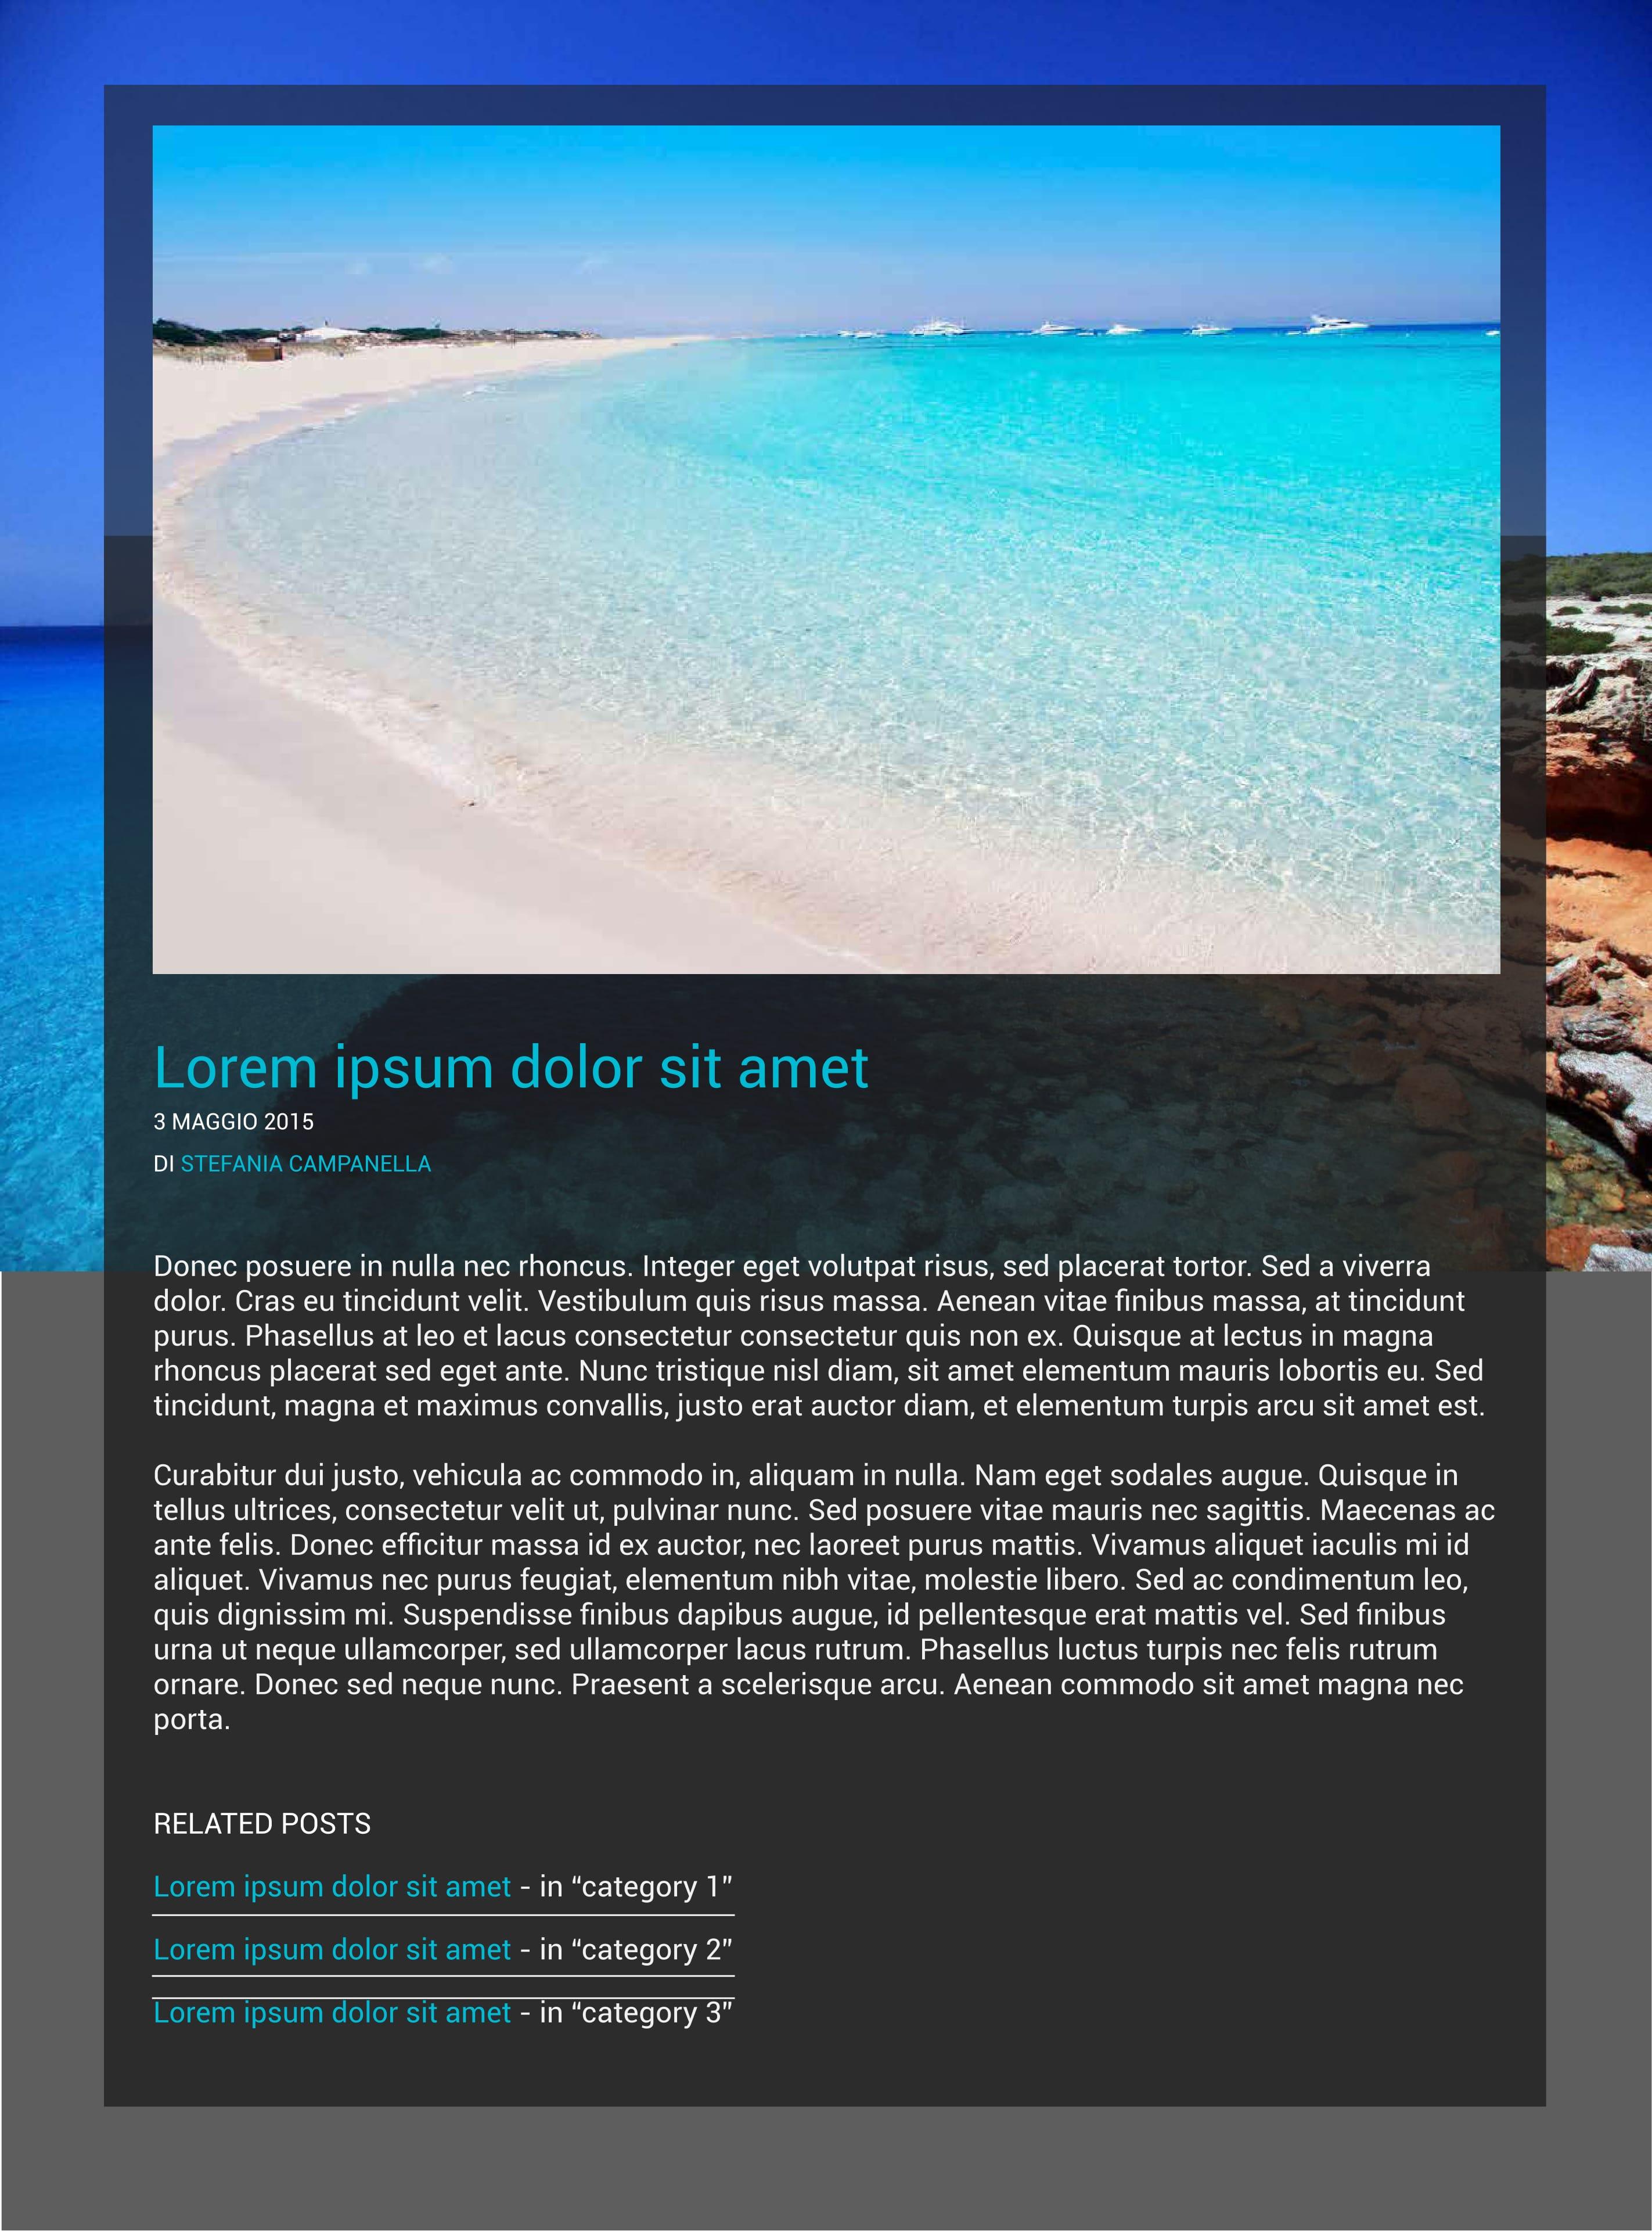 Formentera blog article detail 1